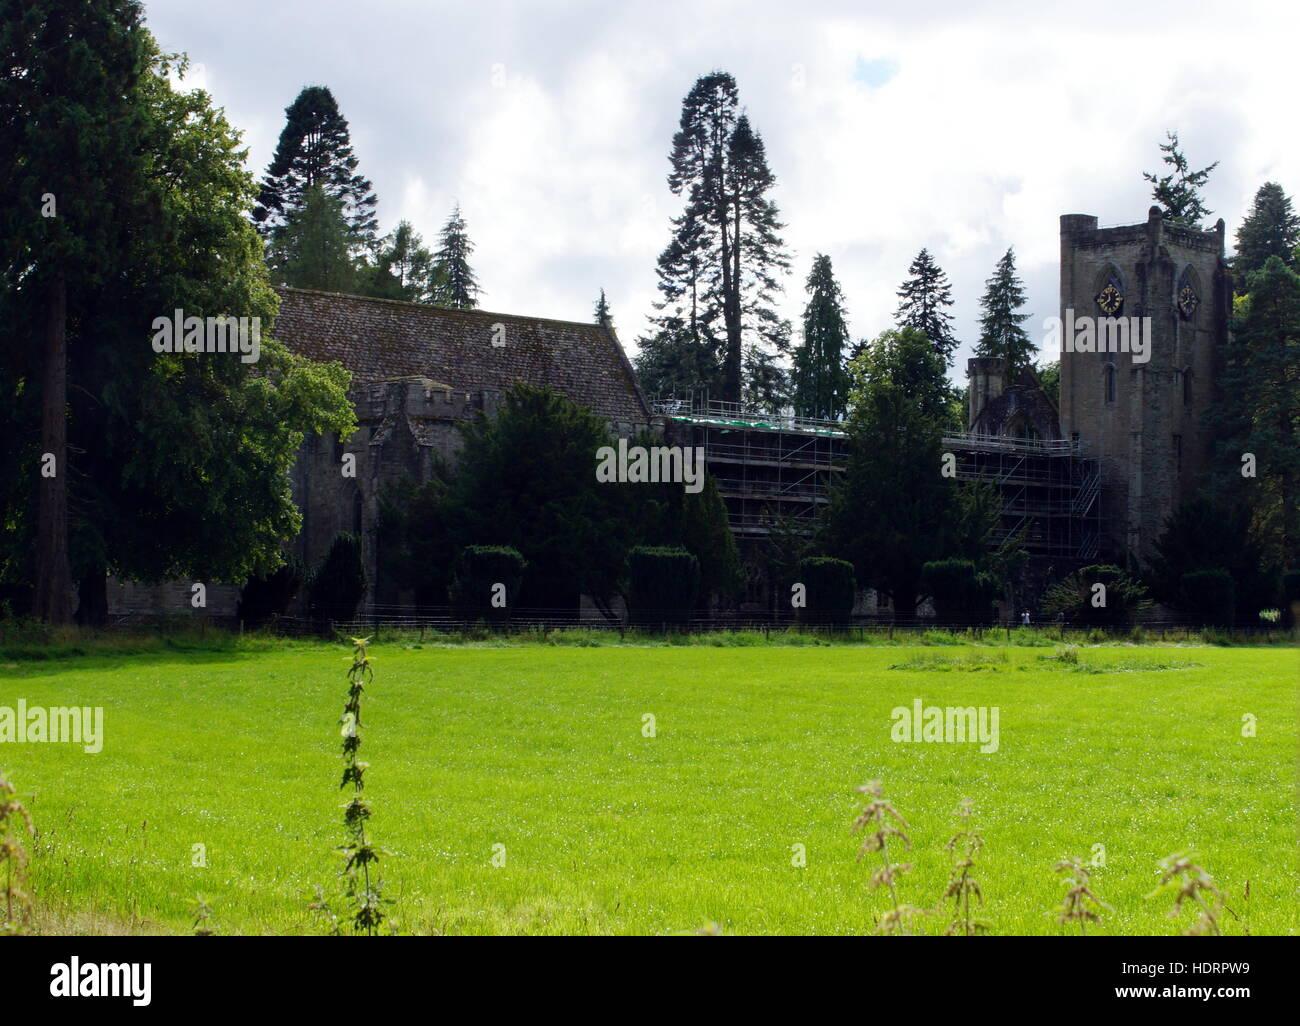 Dunkeld castle in United Kingdom - Stock Image